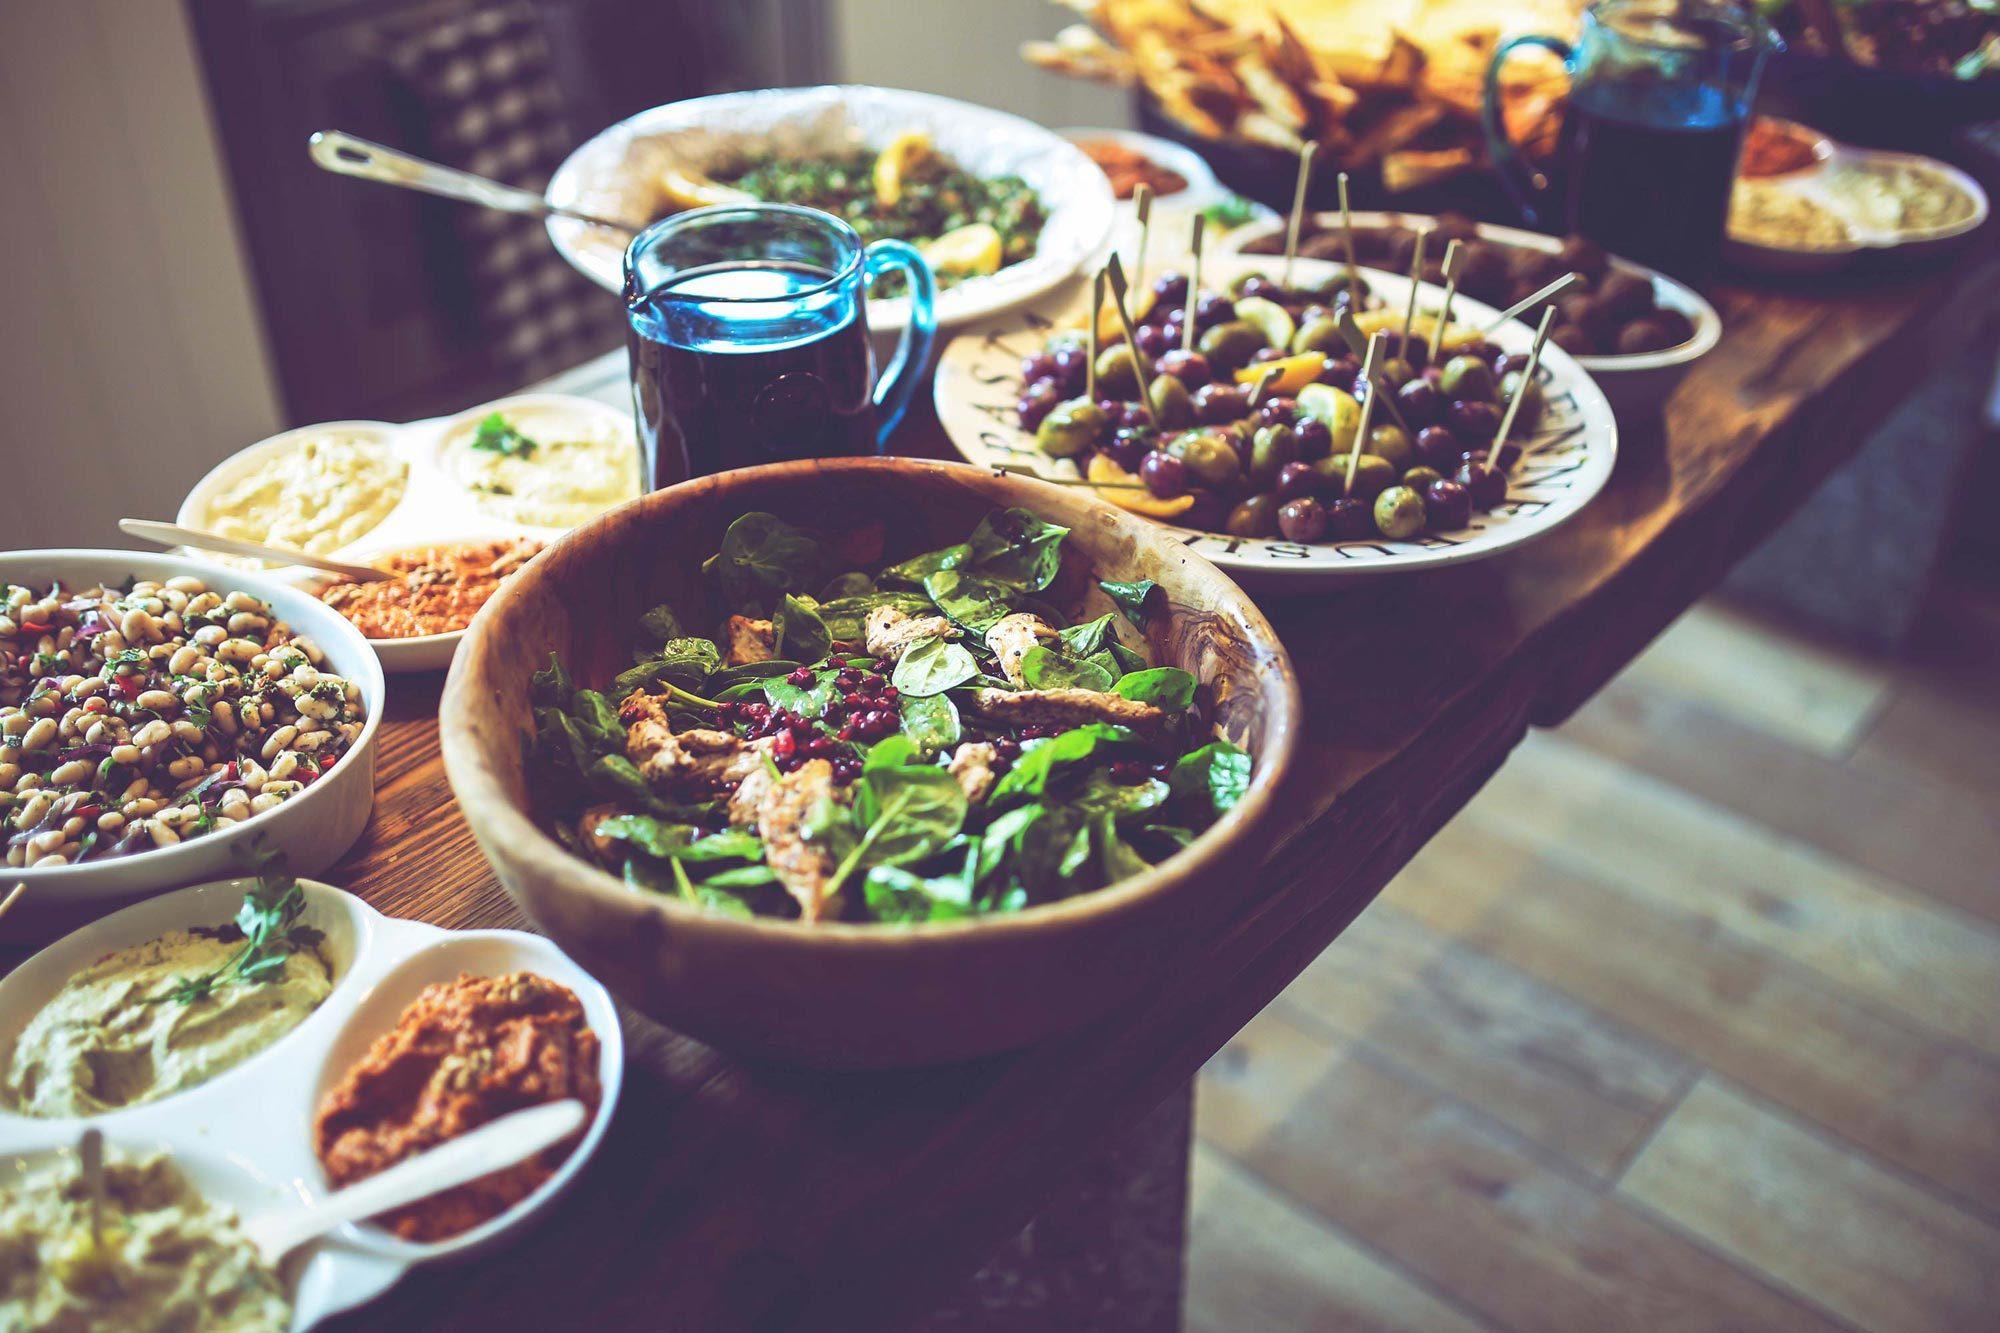 Food salad healthy vegetables 2000 1333 for Cuisine 2000